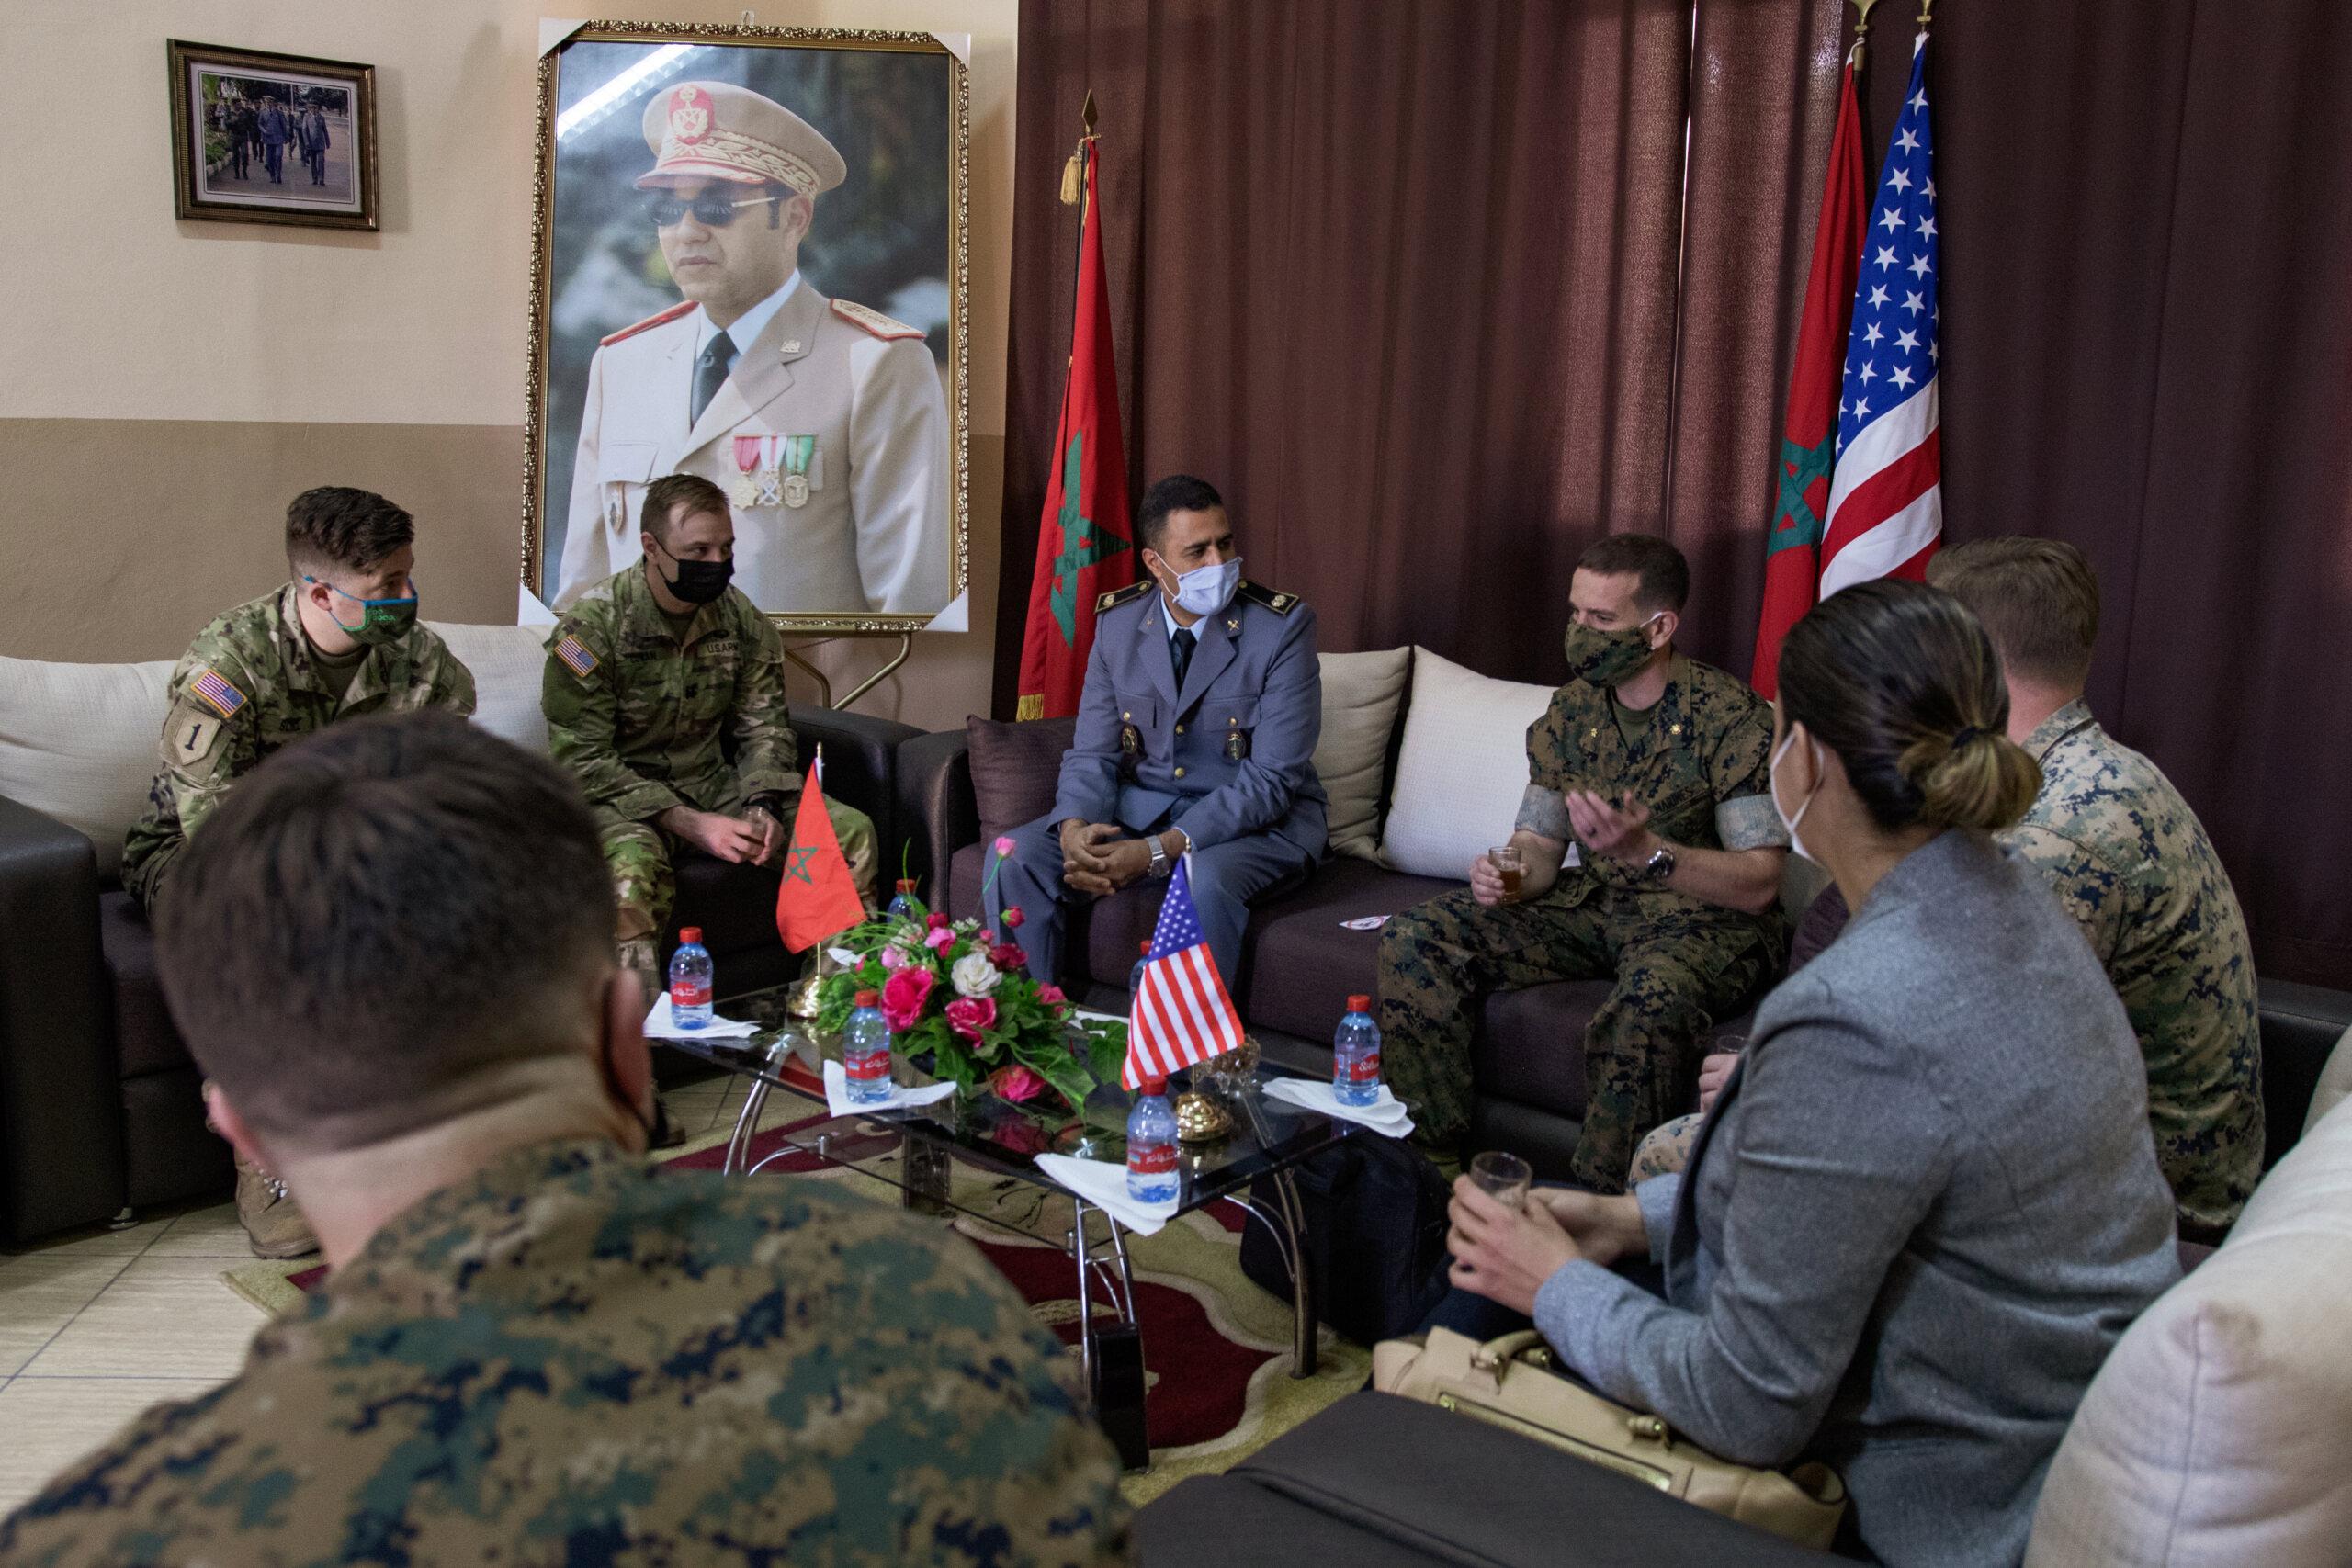 Cooperation militaire avec les USA - Page 9 21031913